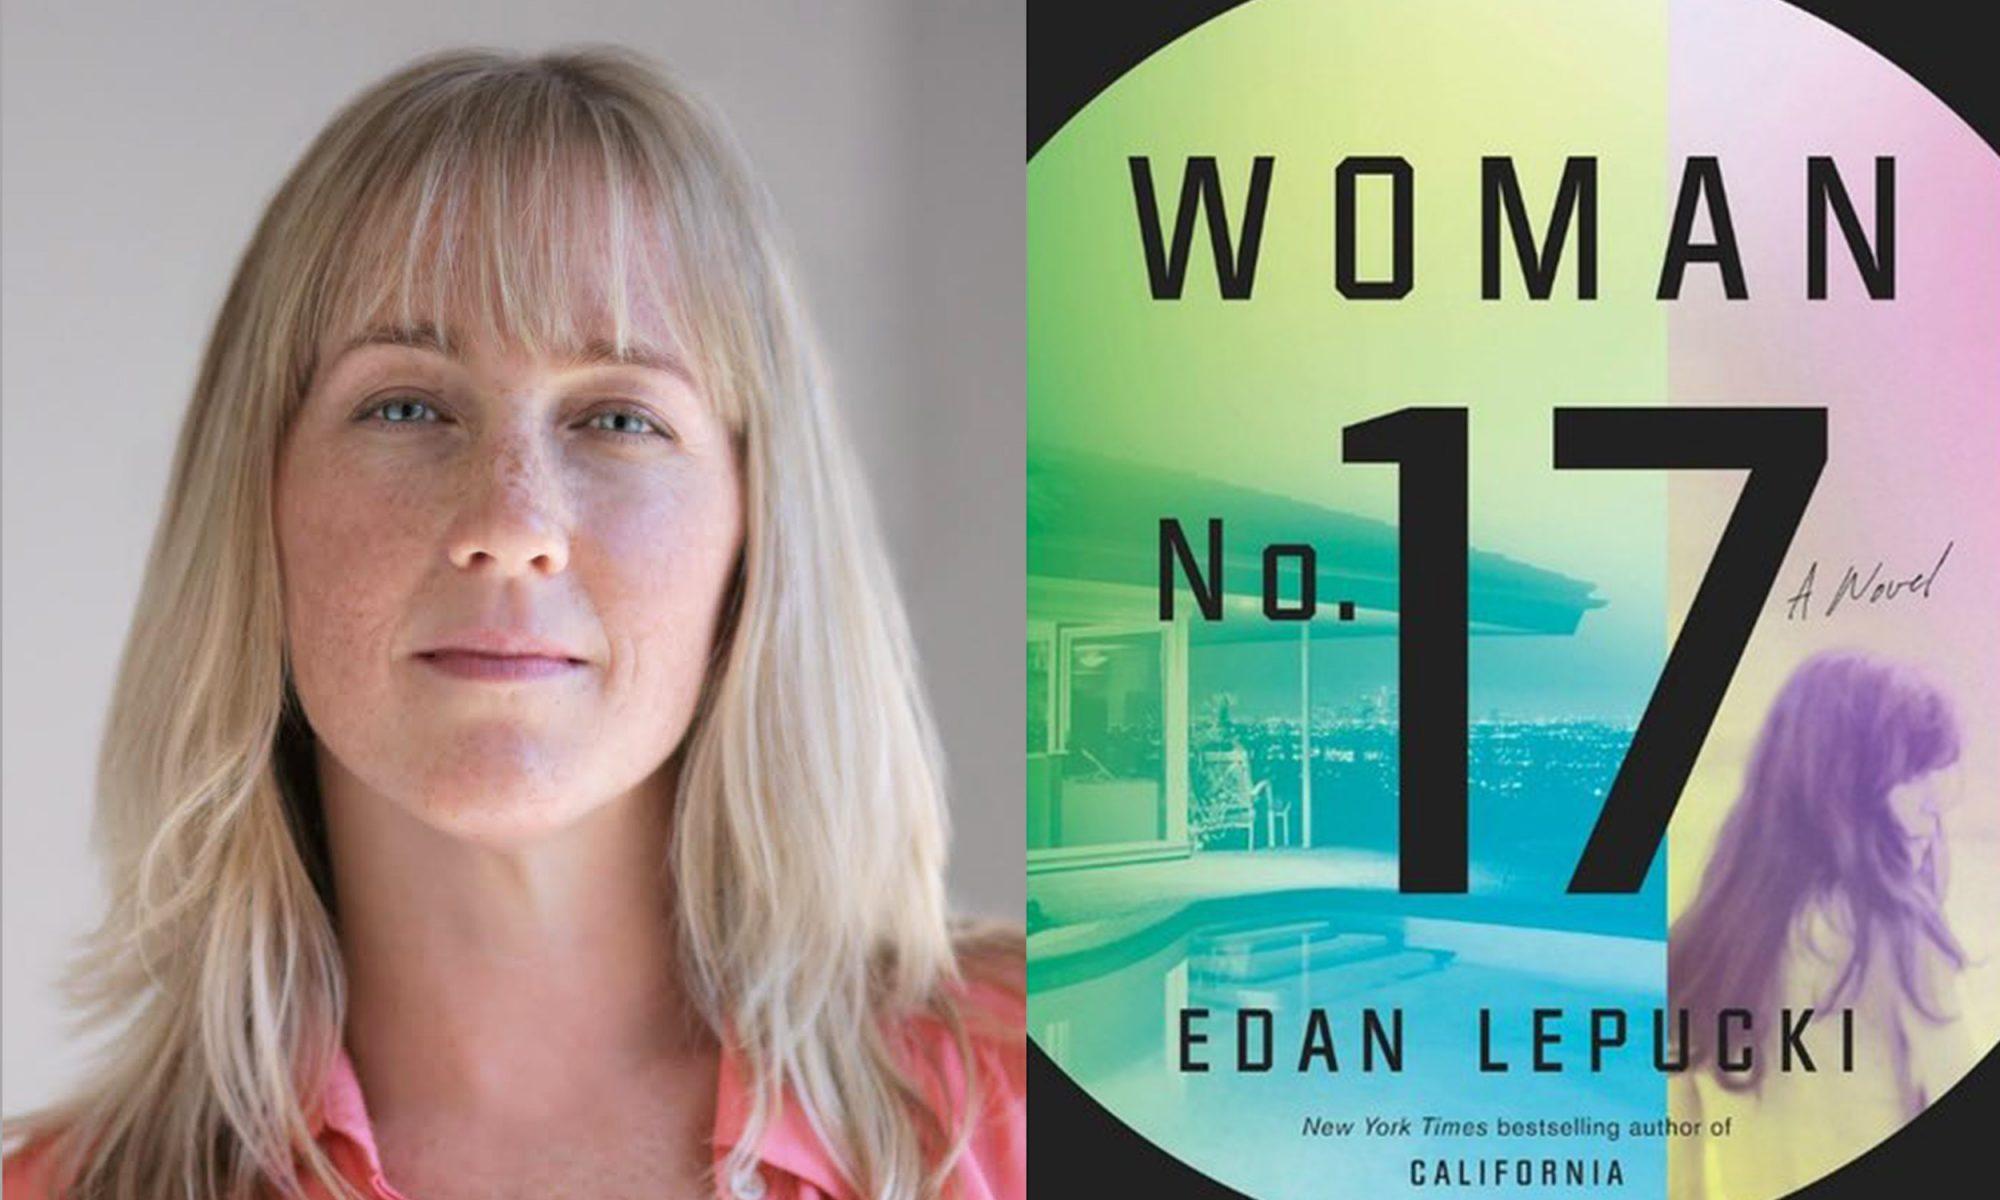 EC: How Edan Lepucki, 'Woman No. 17' Author, Does Breakfast